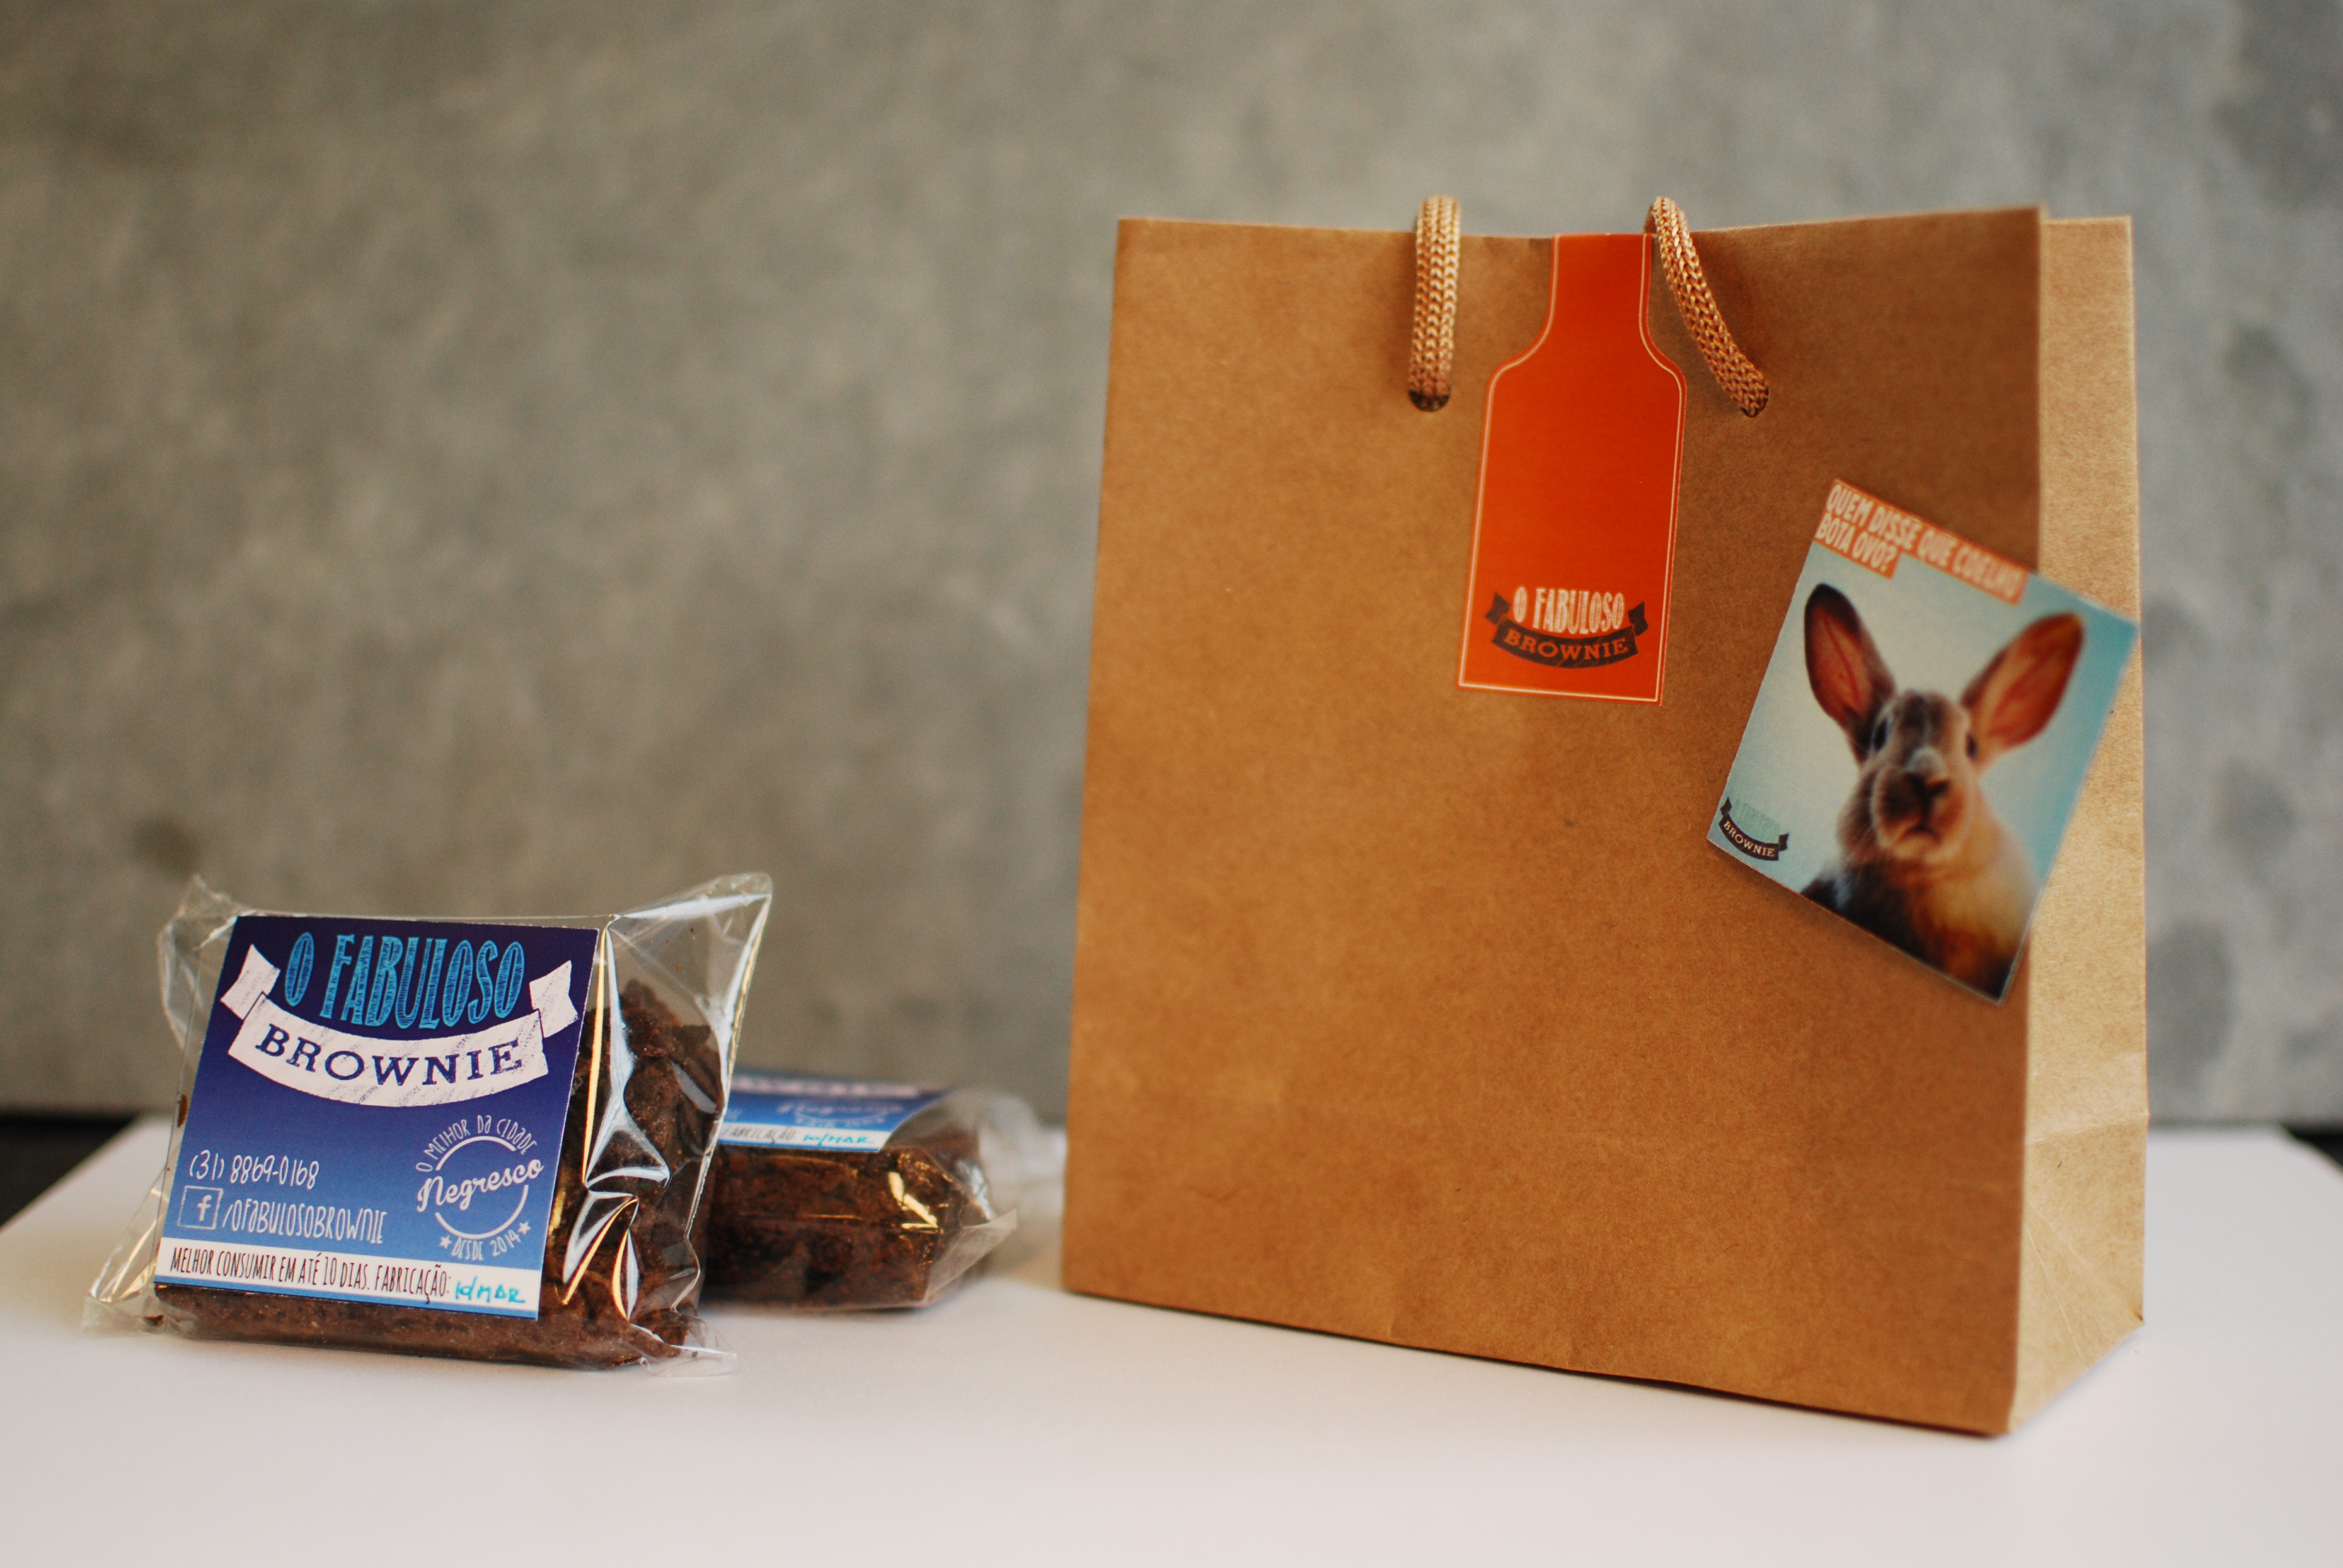 Kit 2 brownies - Páscoa 2015